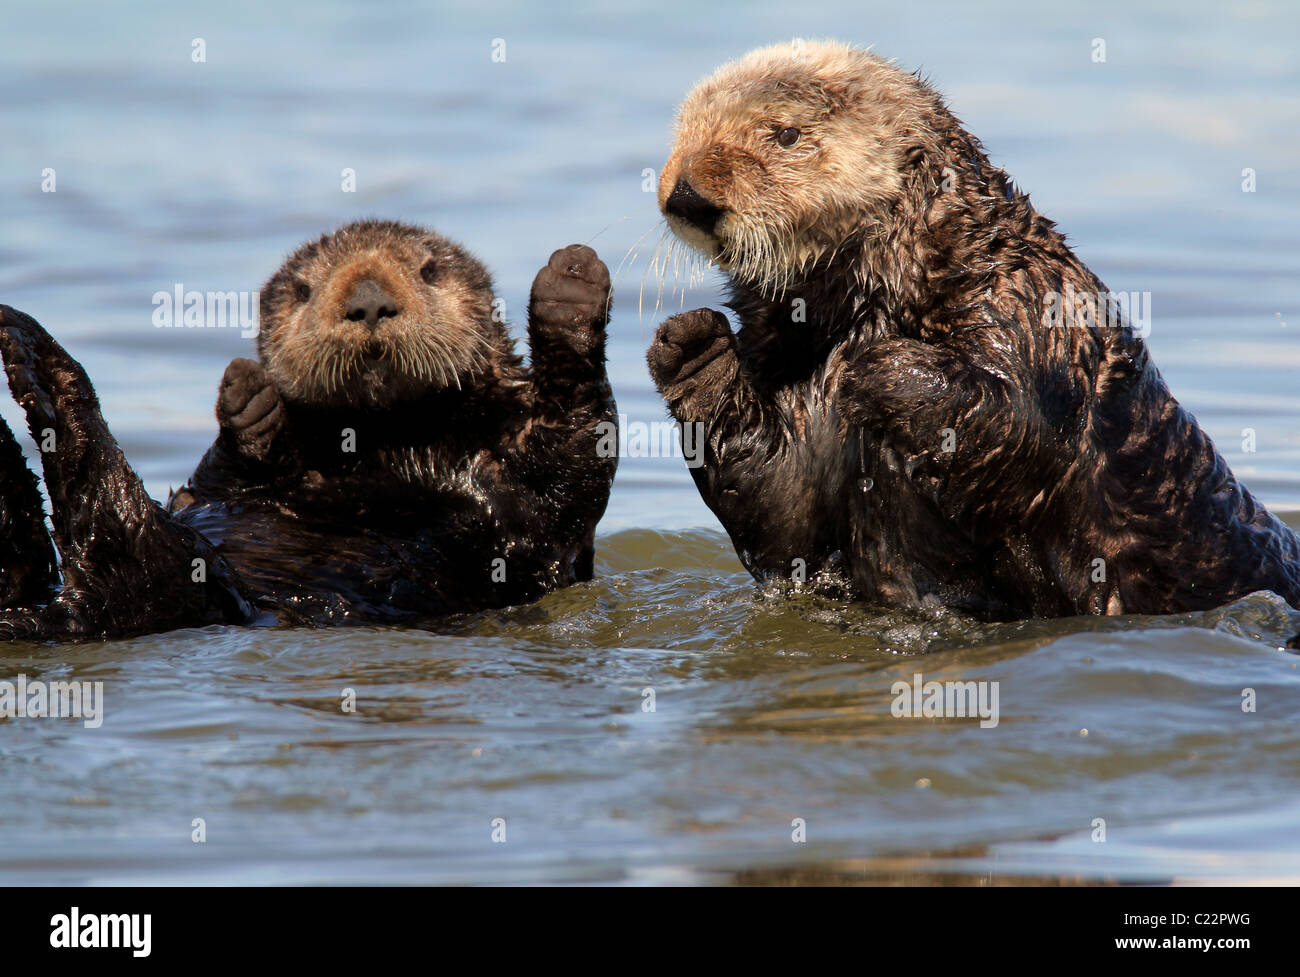 sea Otter playing Moss Landing Monterey Bay Elkhorn Slough National Estuarine Research Reserve - Stock Image